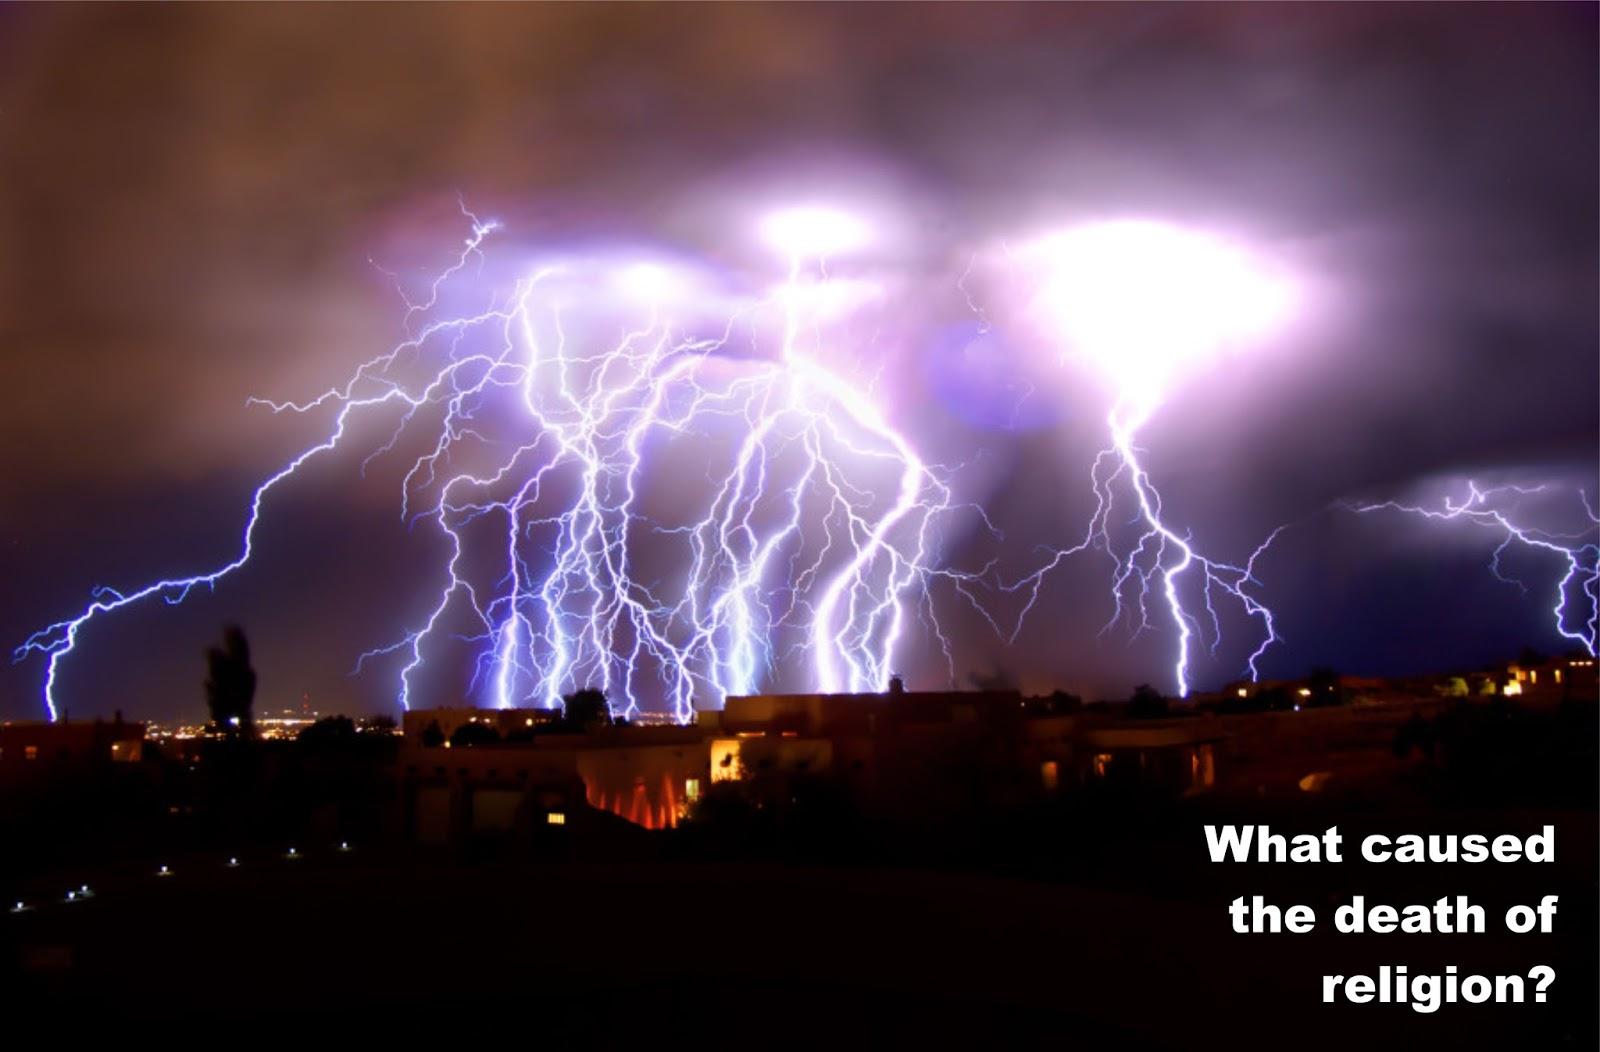 http://alcuinbramerton.blogspot.com/2006/09/what-caused-death-of-religion.html